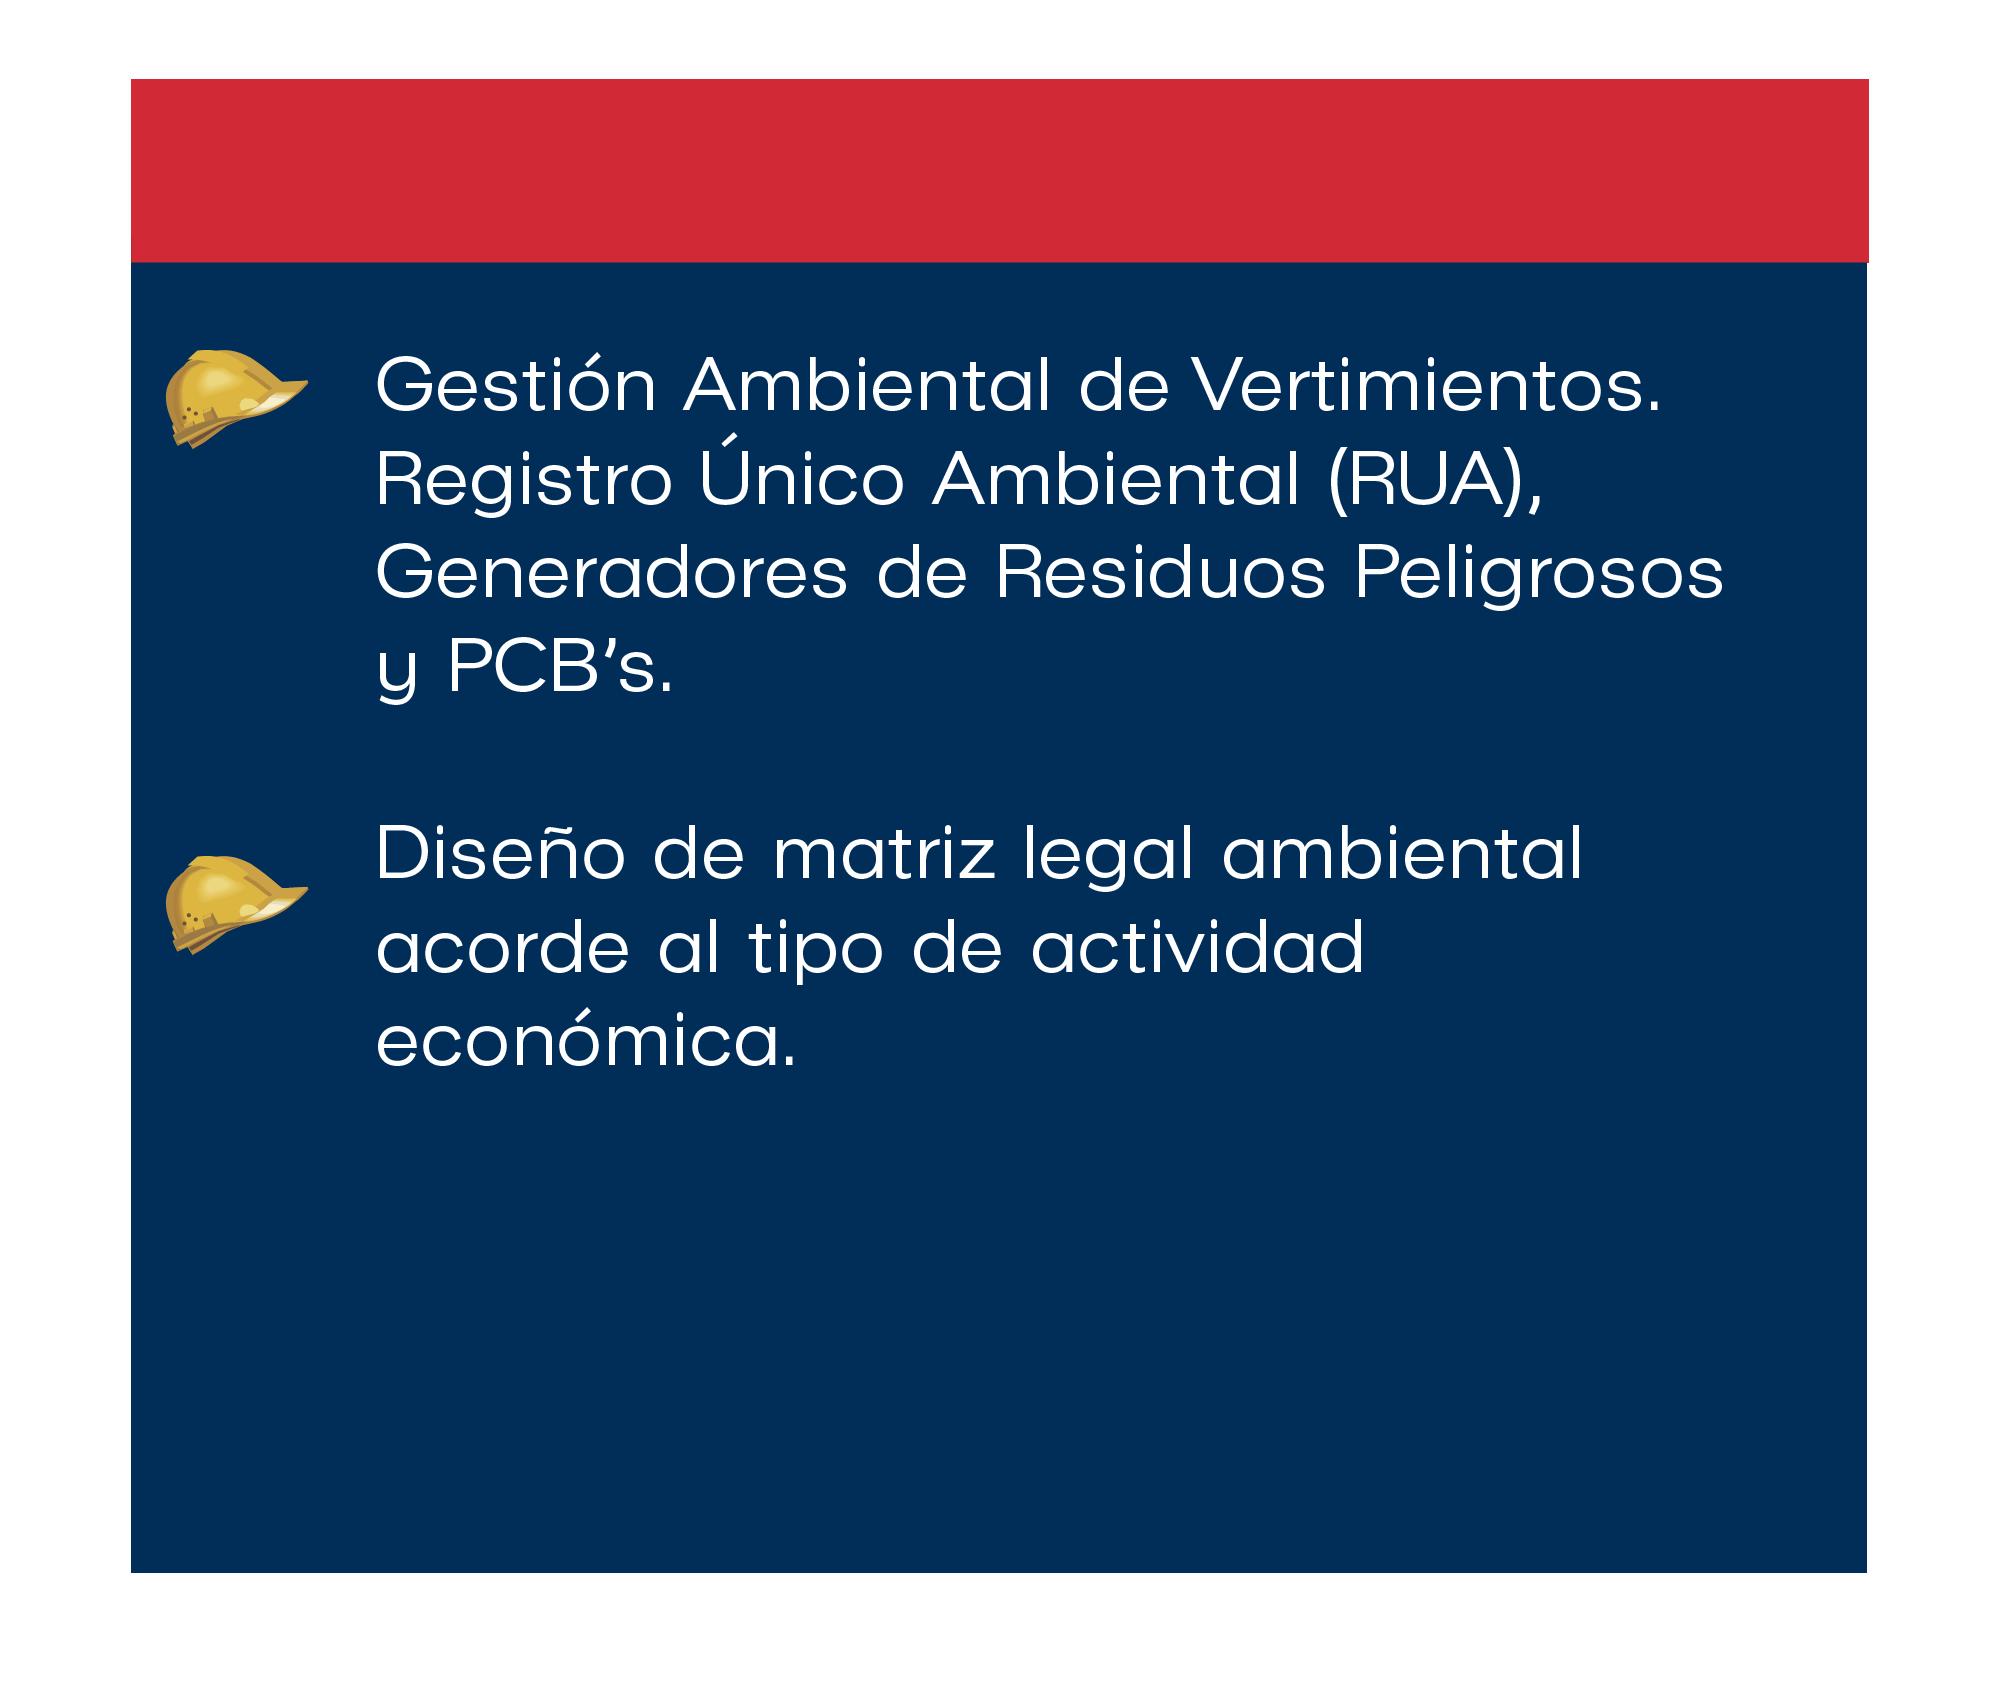 1_asesoríaengestionambiental-02